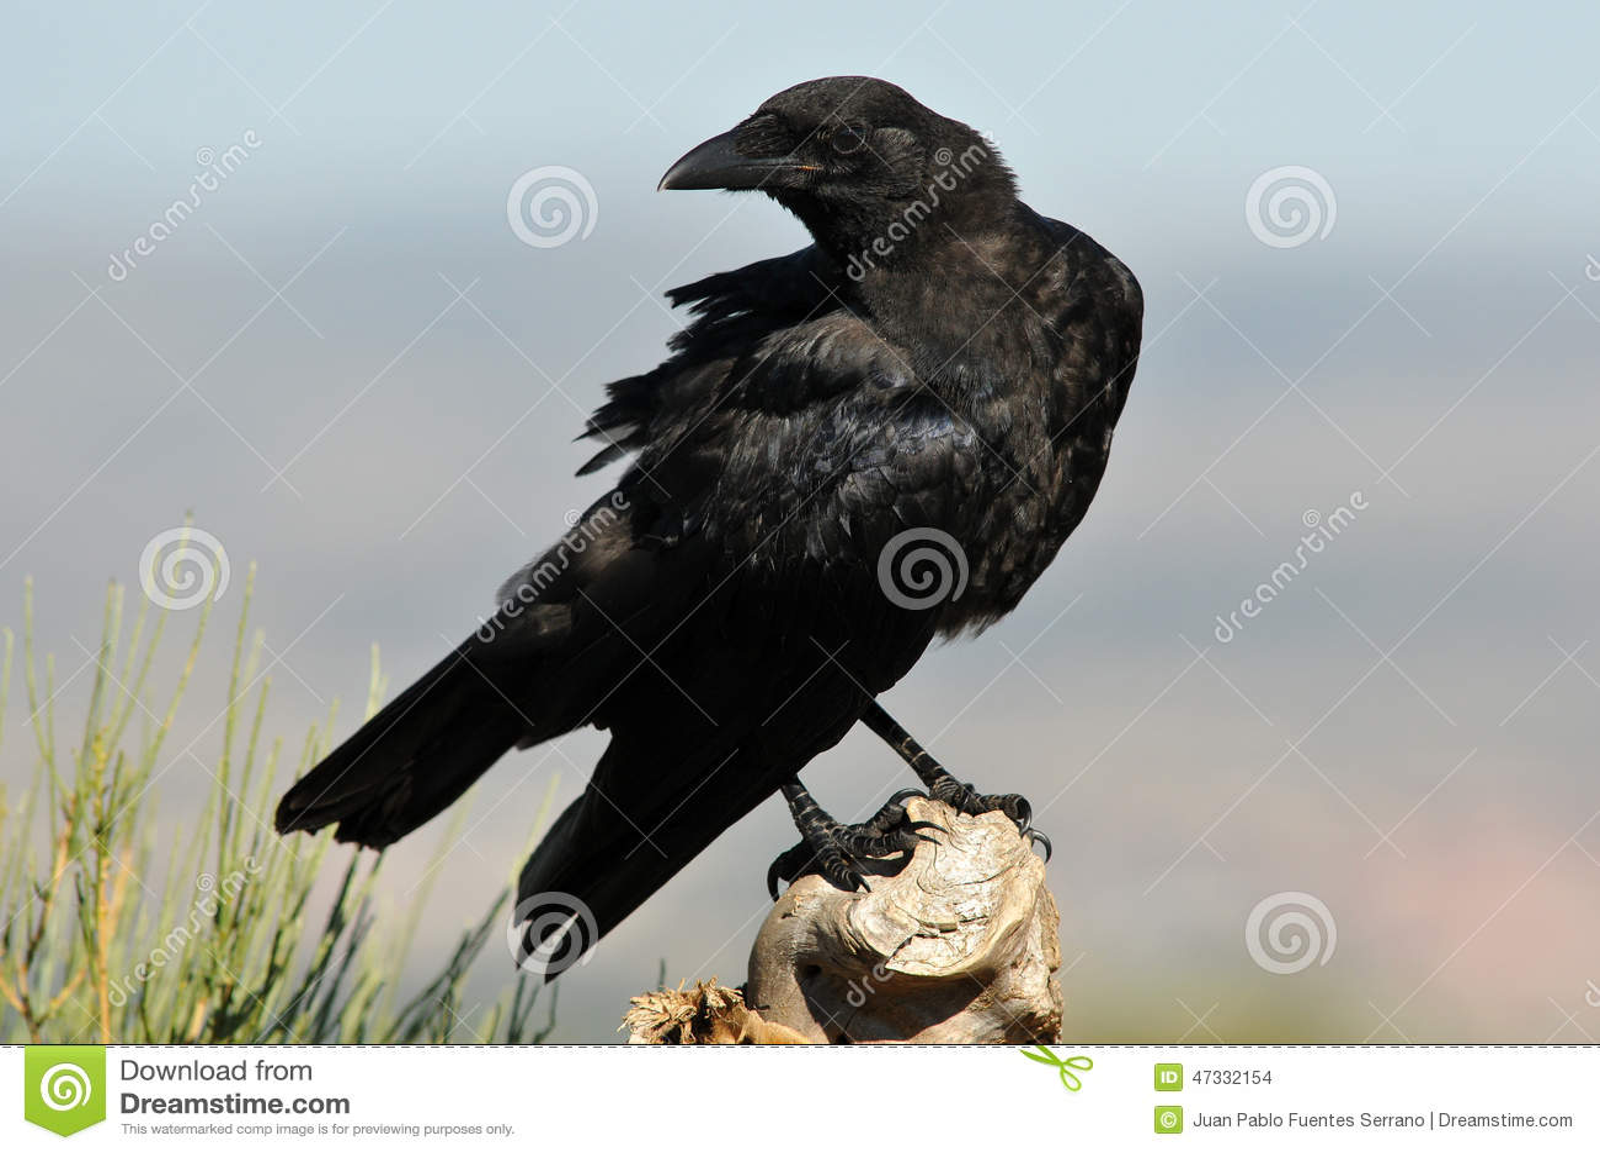 Cuervo encaramado